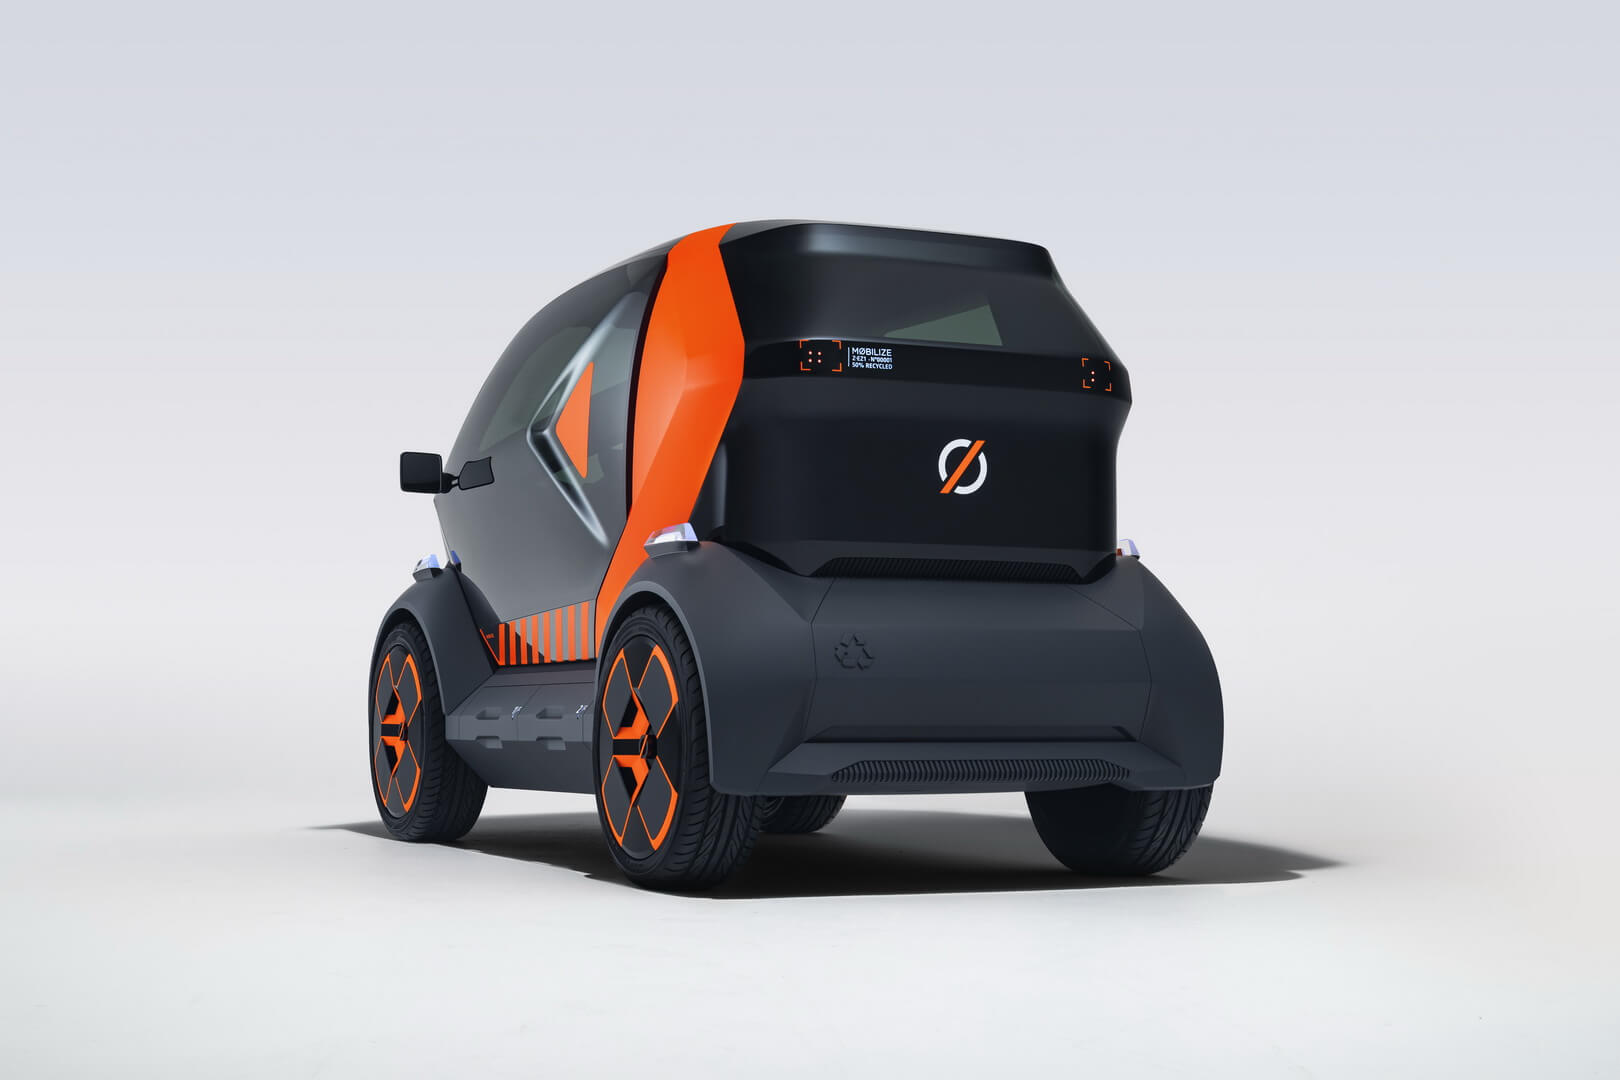 Прототип мини-электромобиля Mobilize EZ-1